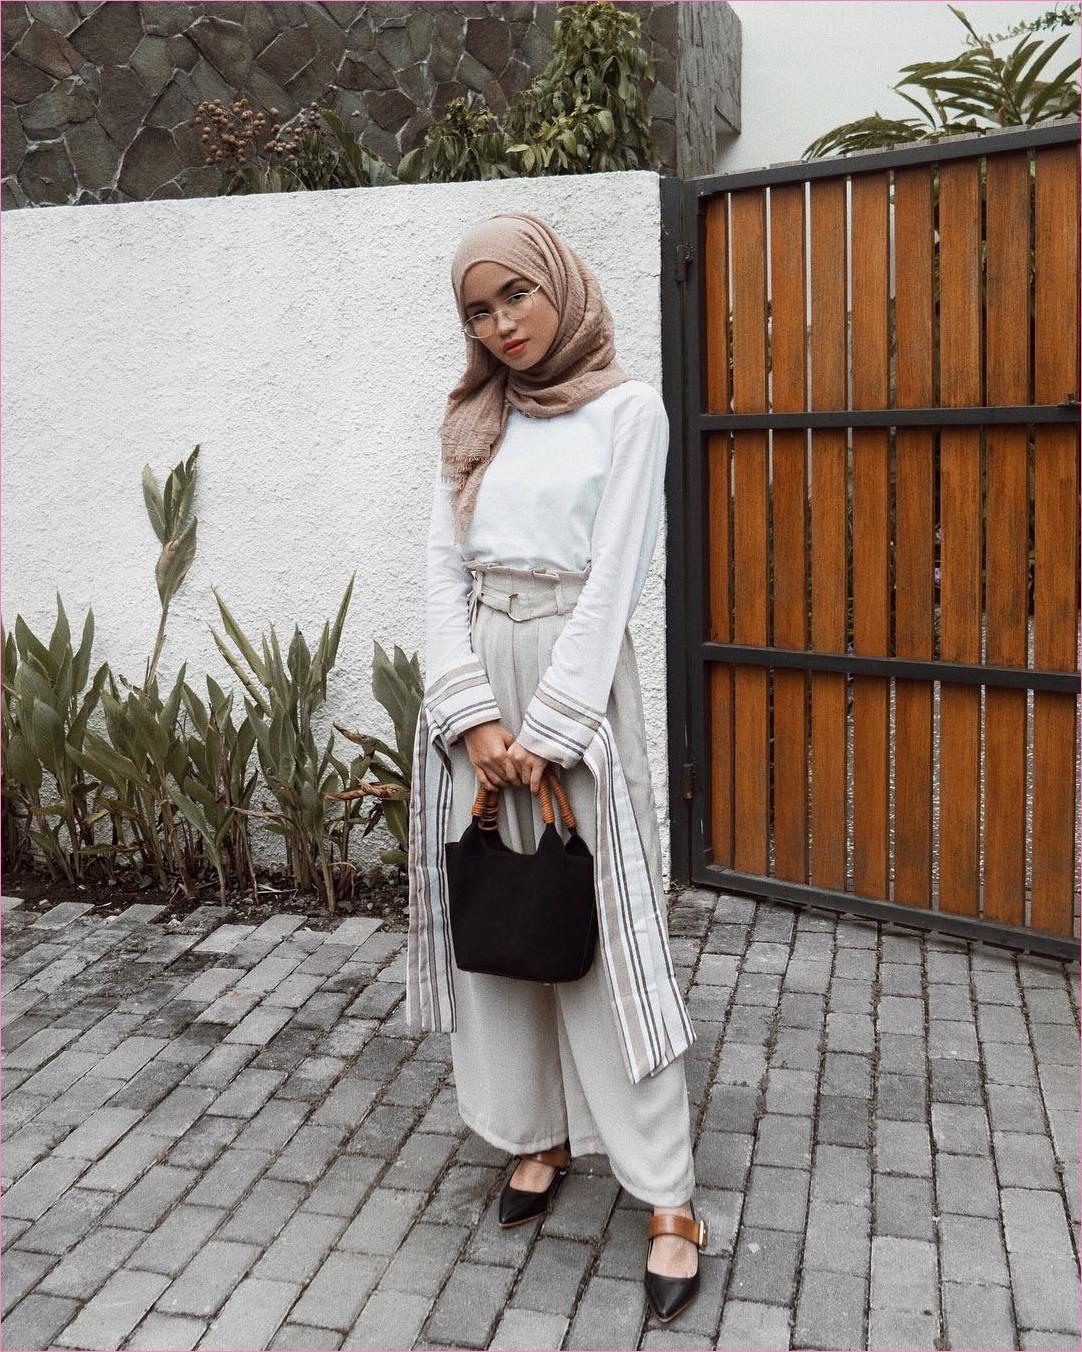 Outfit Kerudung Pashmina Ala Selebgram 2018 hijab pashmina rawis krem top blouse baju kemeja putih celana kulot pallazo abu muda loafers and slip ons flatshoes hitam handbag coklat kacamata bulat ootd trendy kekinian hijabers